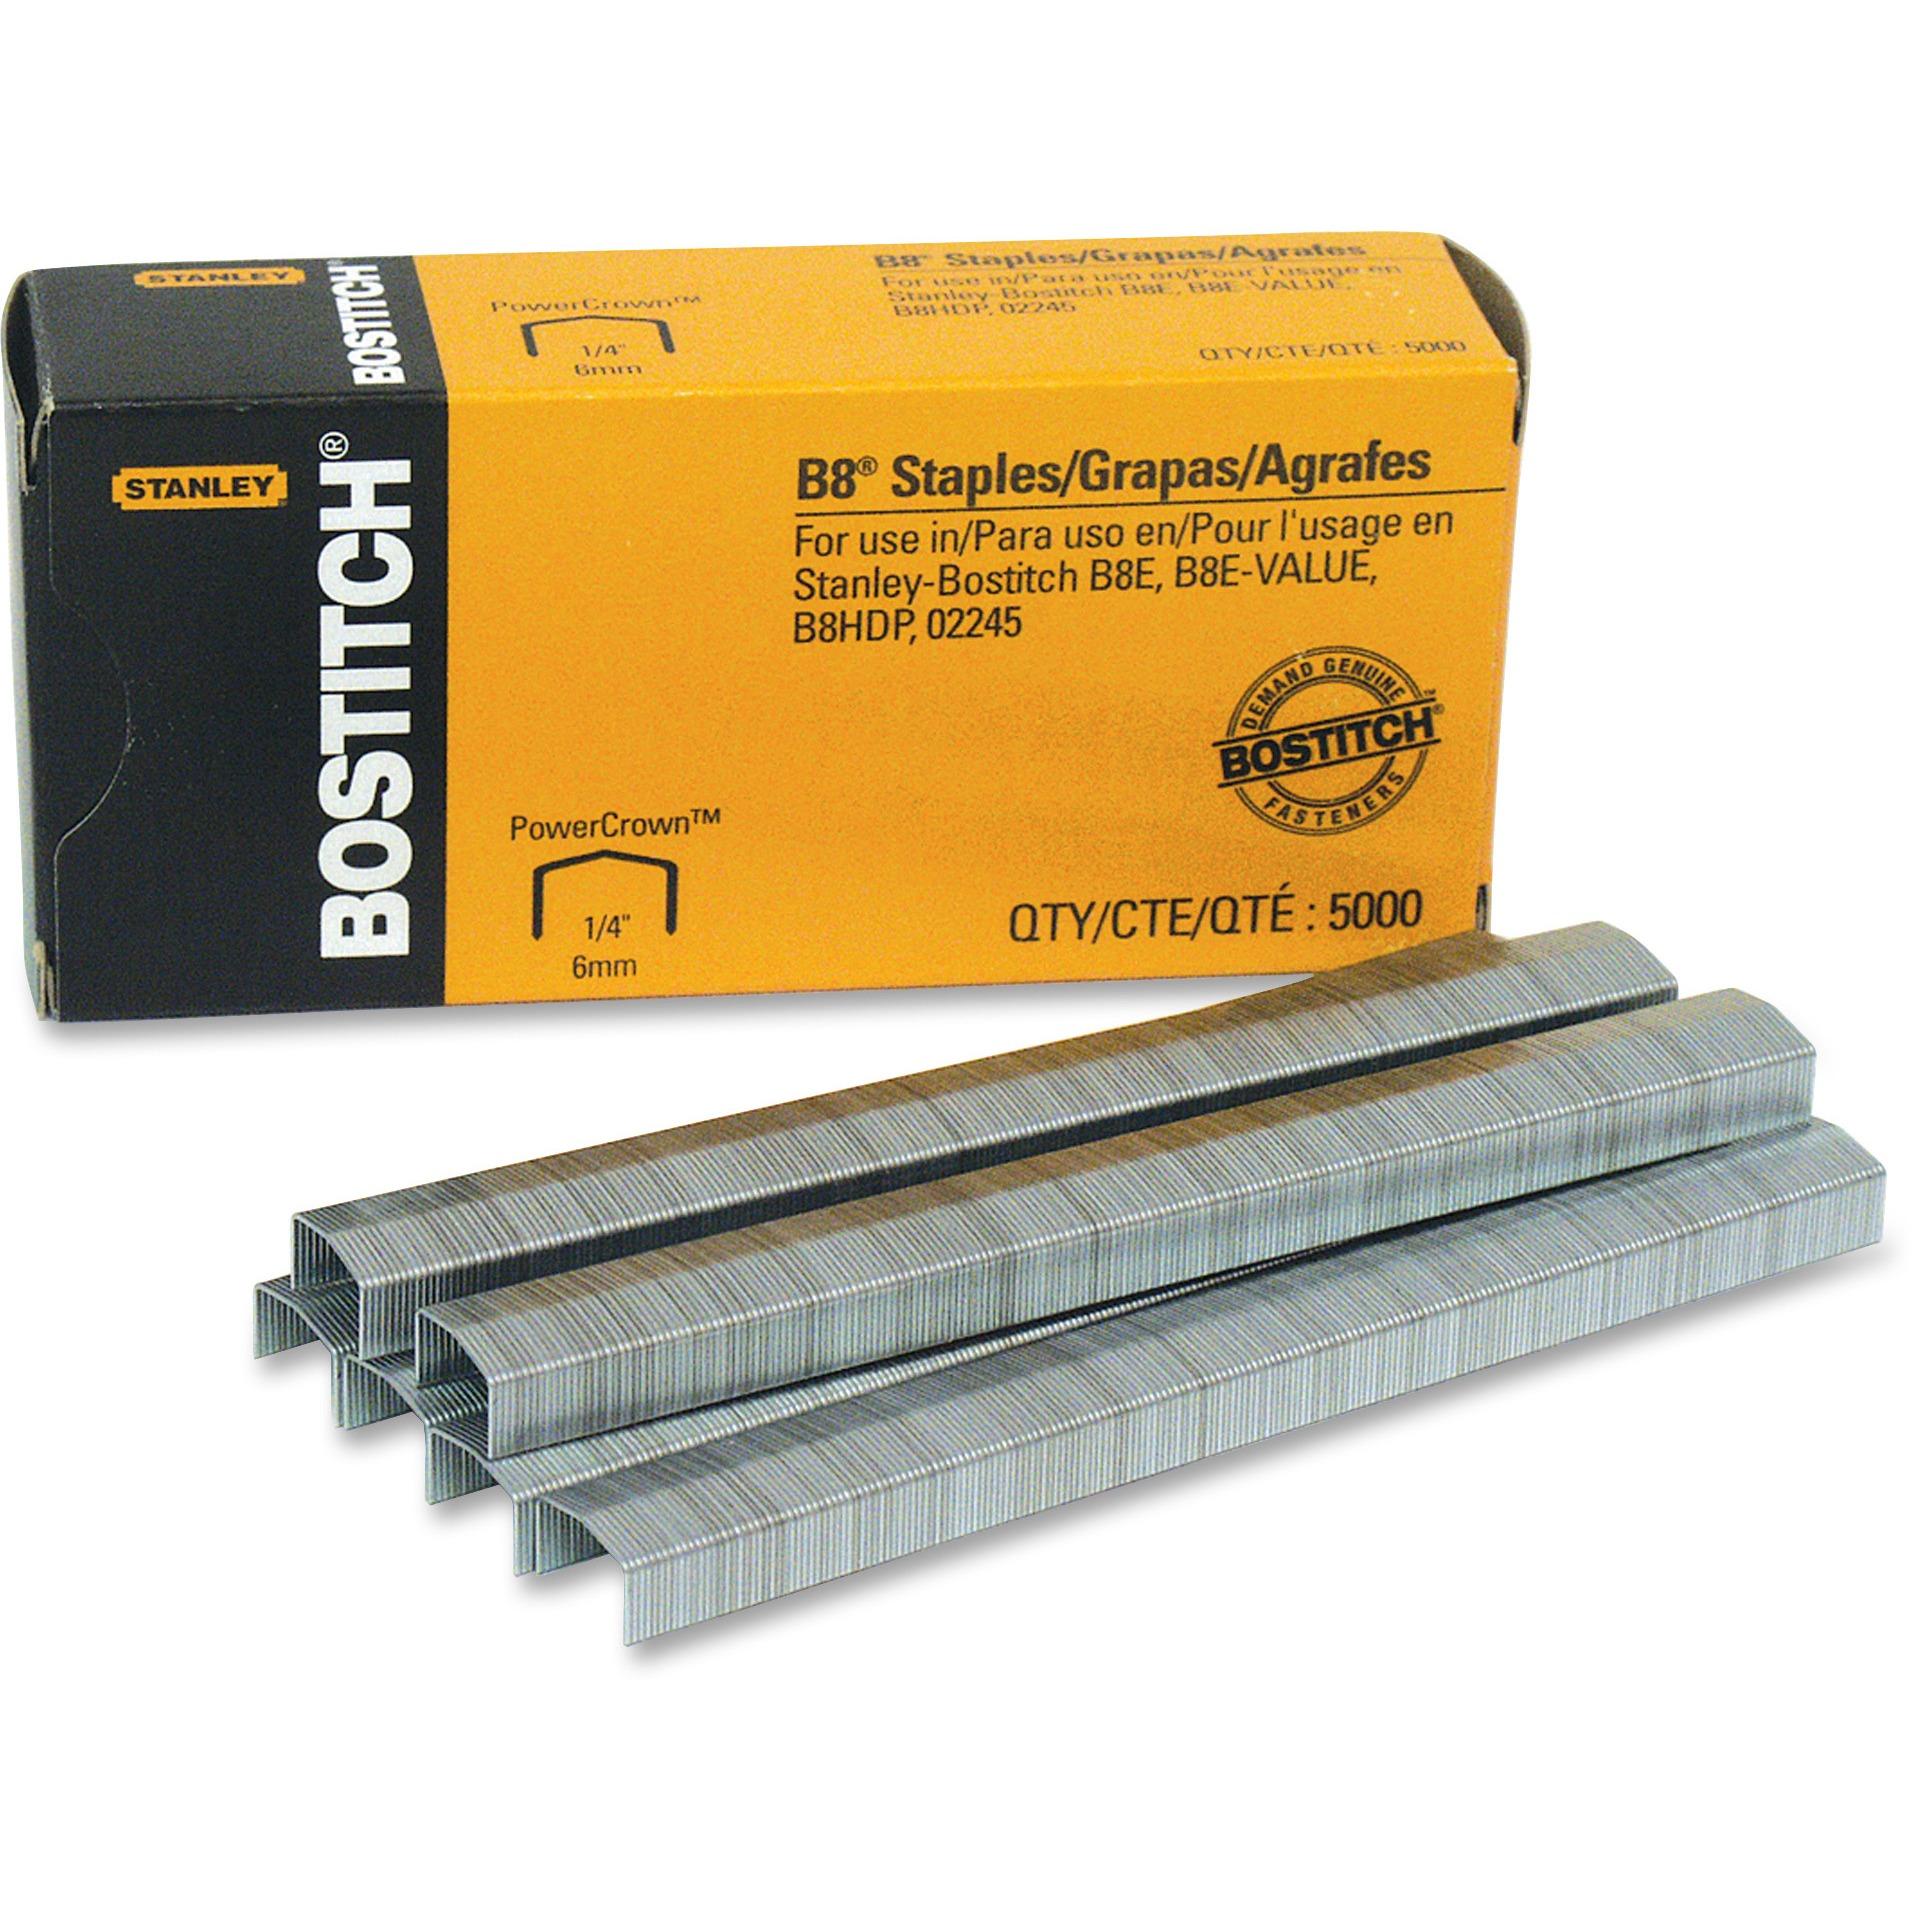 "Bostitch B8 PowerCrown Premium Staples, 1/4"" Leg Length, 5000/Box"